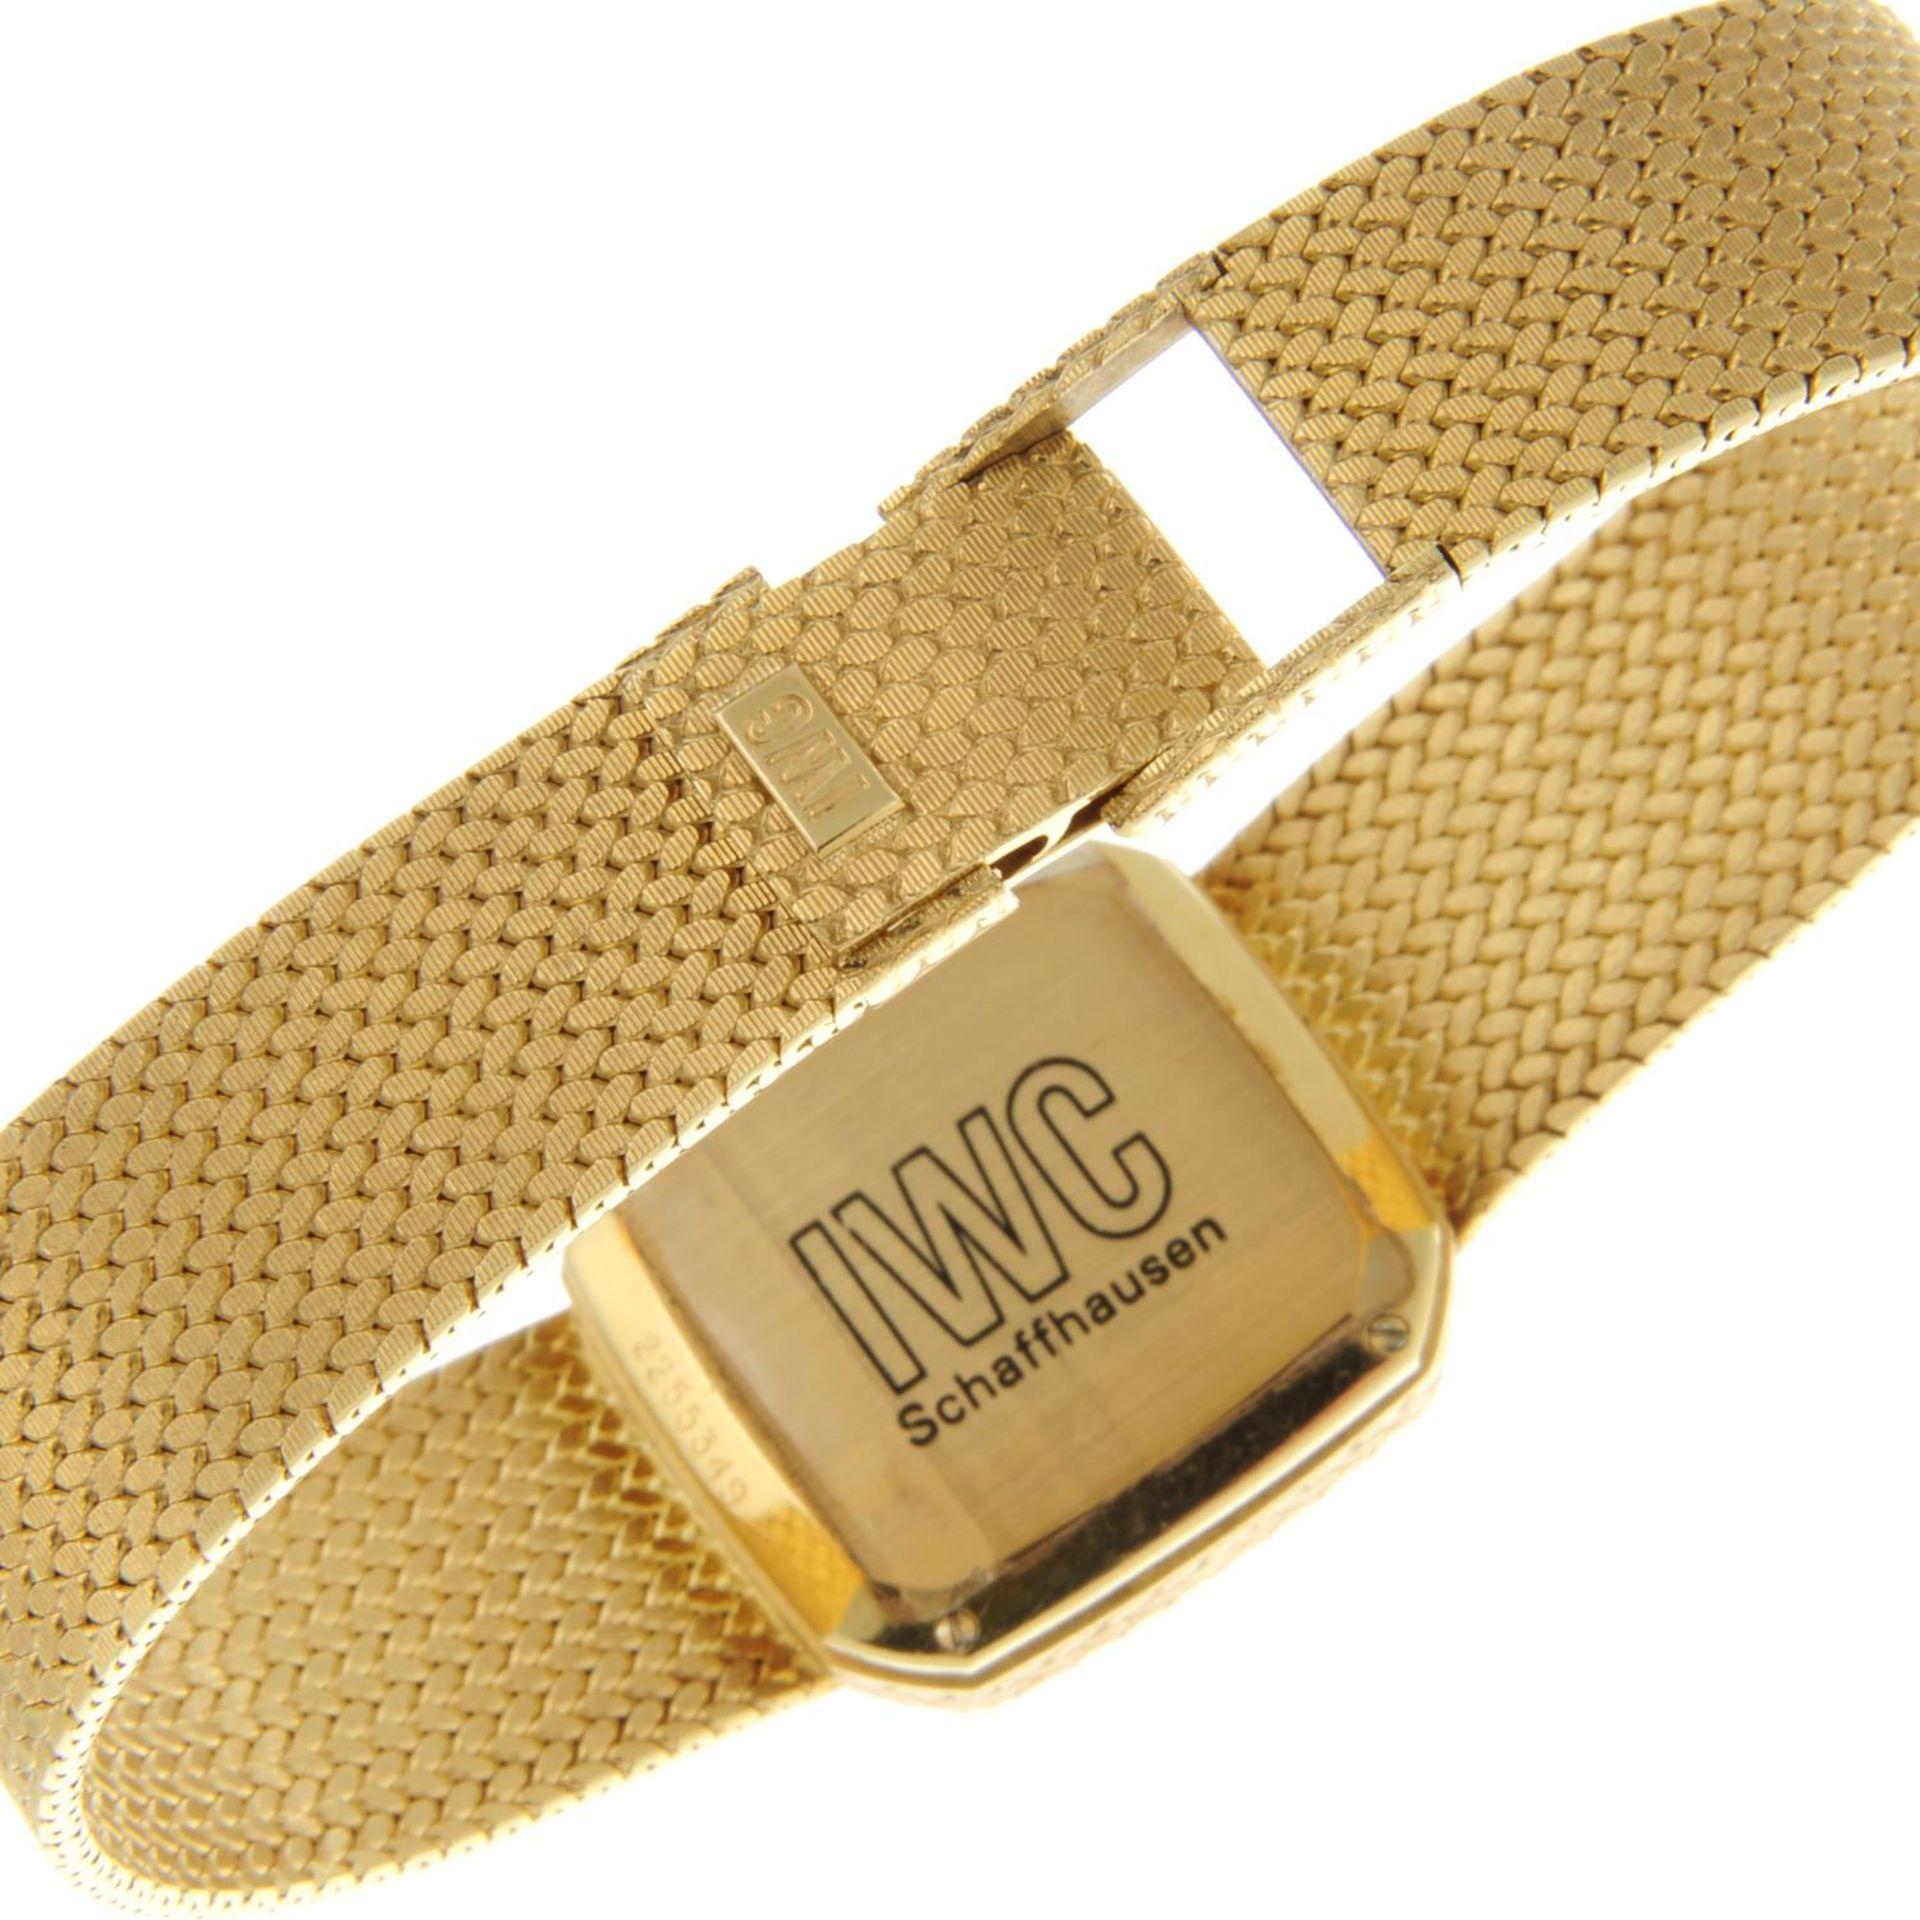 IWC - a bracelet watch. - Bild 2 aus 5